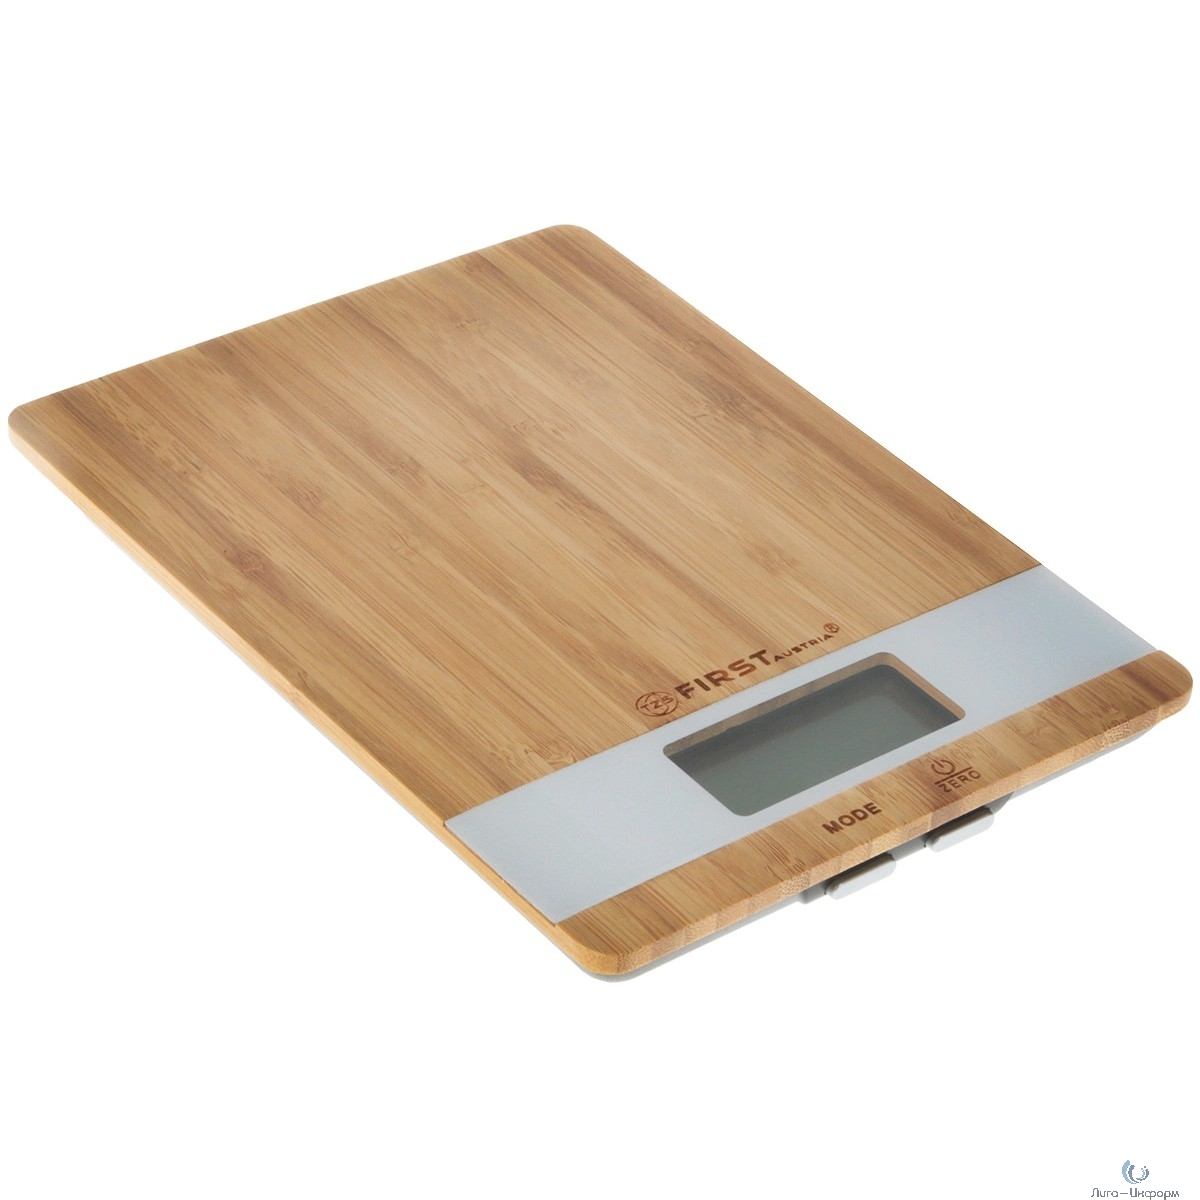 FIRST FA-6410 Весы кухонные, електронные, бамбук.платф., электр., 5 кг, 1 гр, тарокомпенсация, белые.